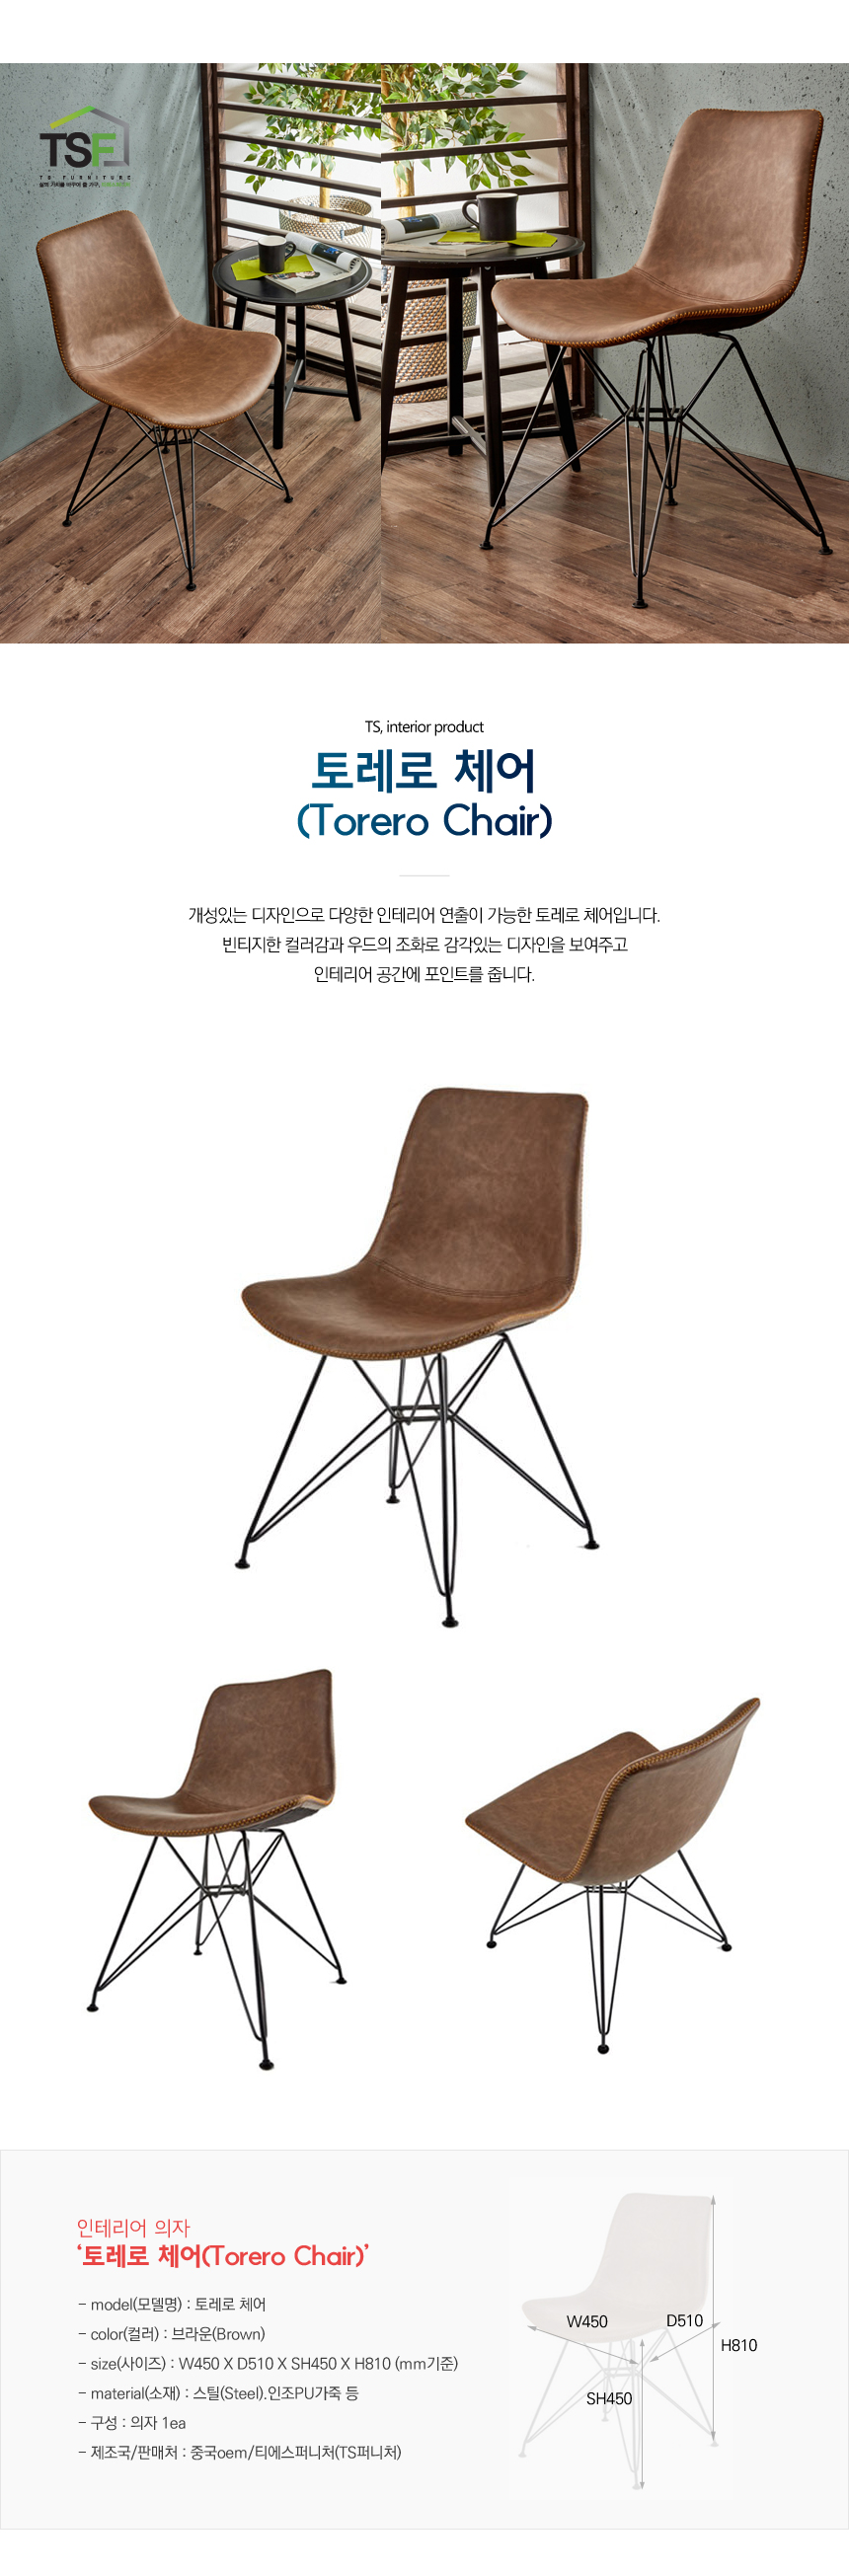 I 토레로 체어 카페 인테리어 식탁의자 - 티에스퍼니처, 102,000원, 식탁/의자, 식탁 의자